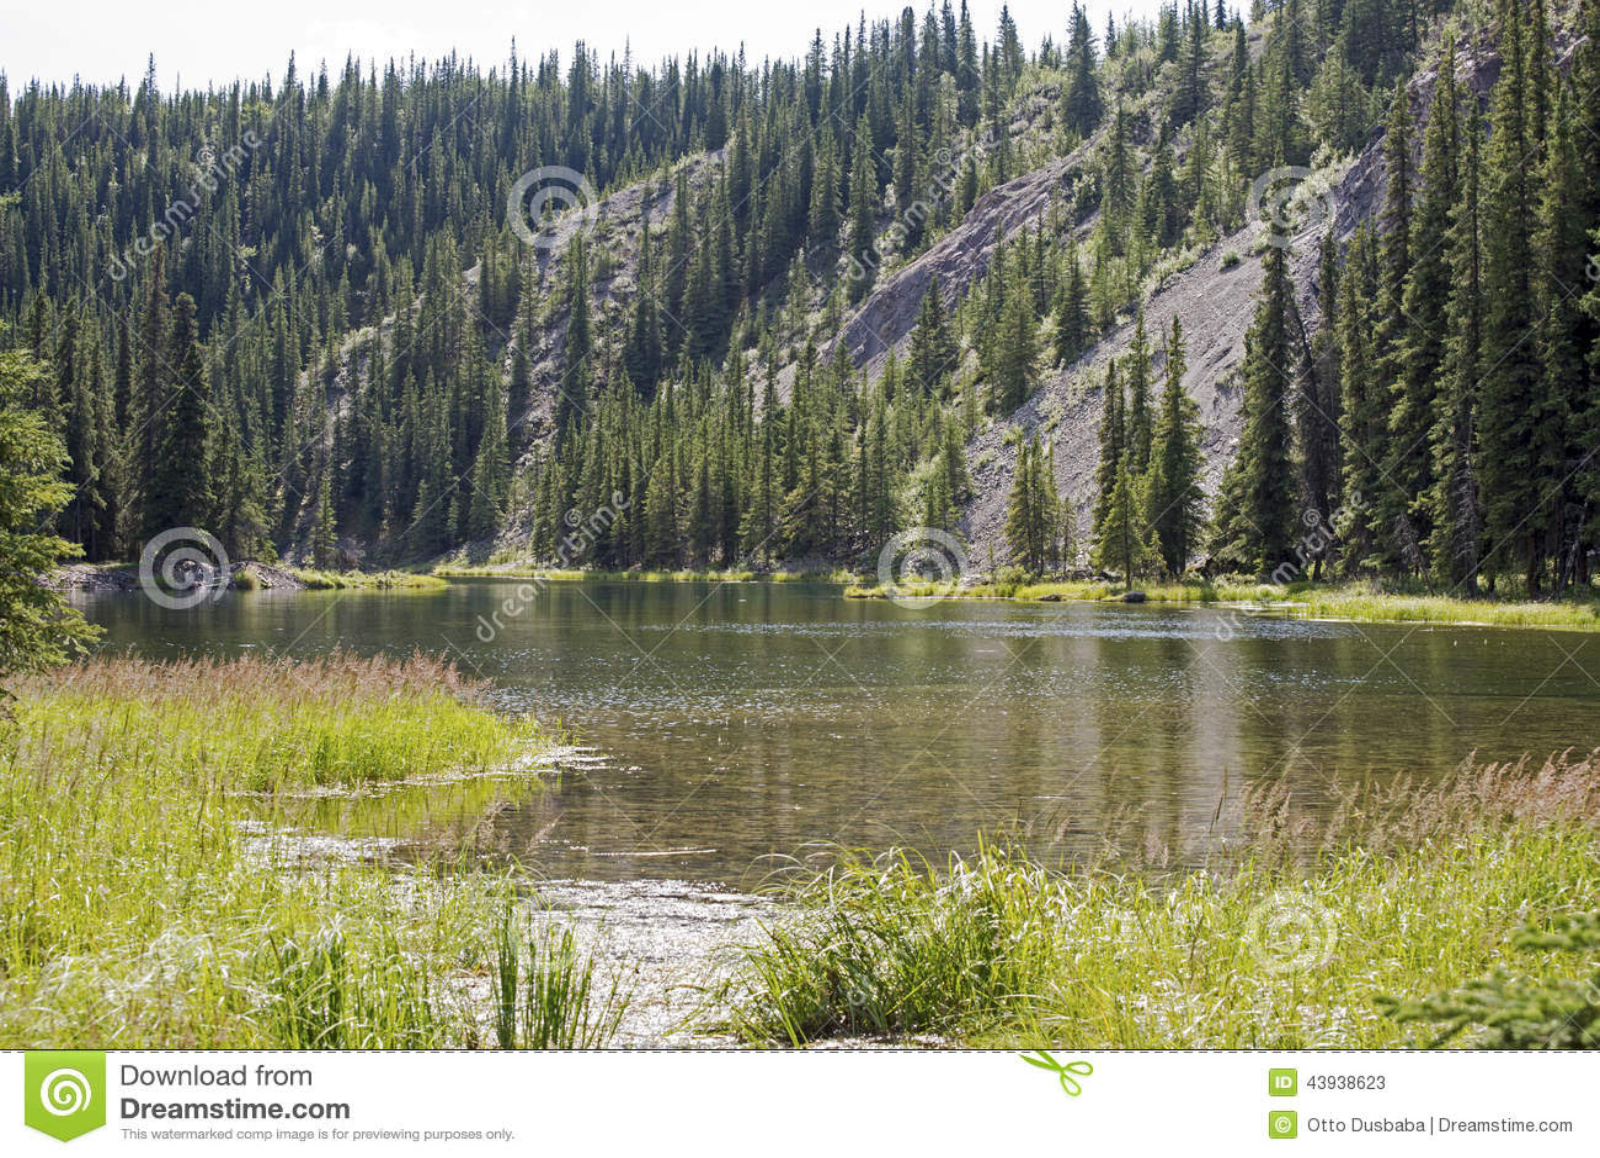 Lake In The Alaskan Wilderness Stock Photo  Image: 43938623